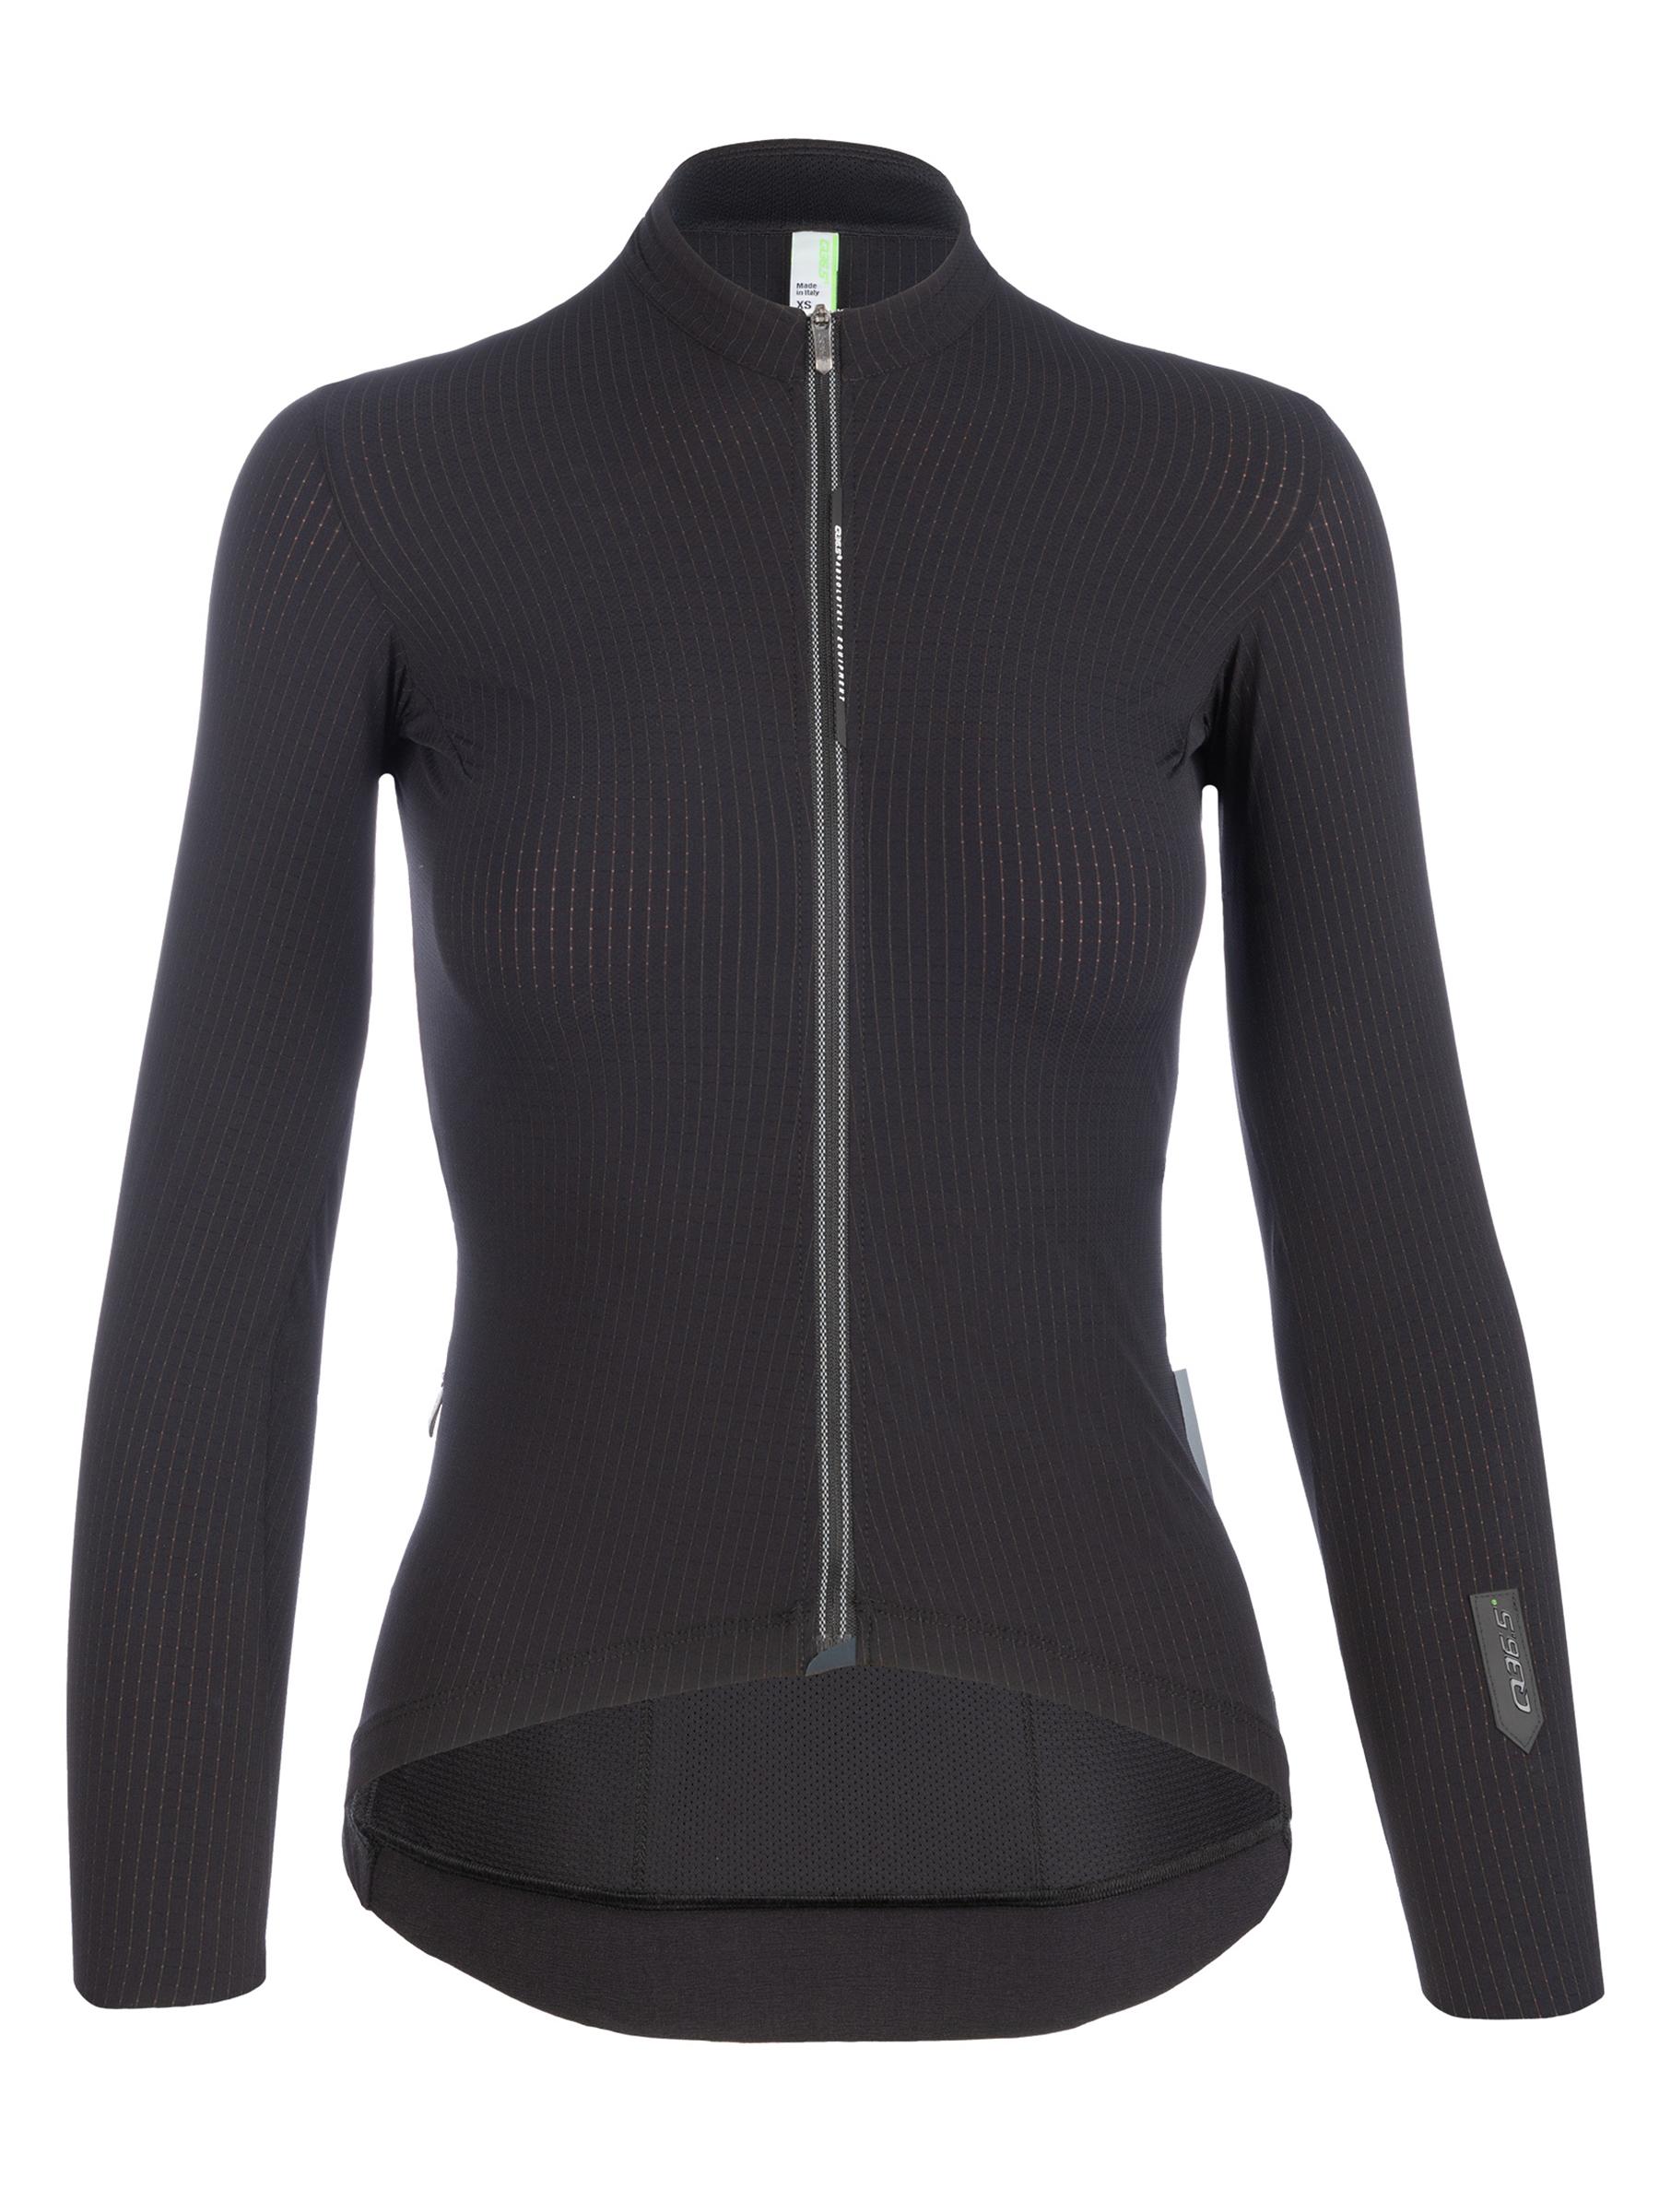 Maglia ciclismo donna maniche lunghe Pinstripe X nera